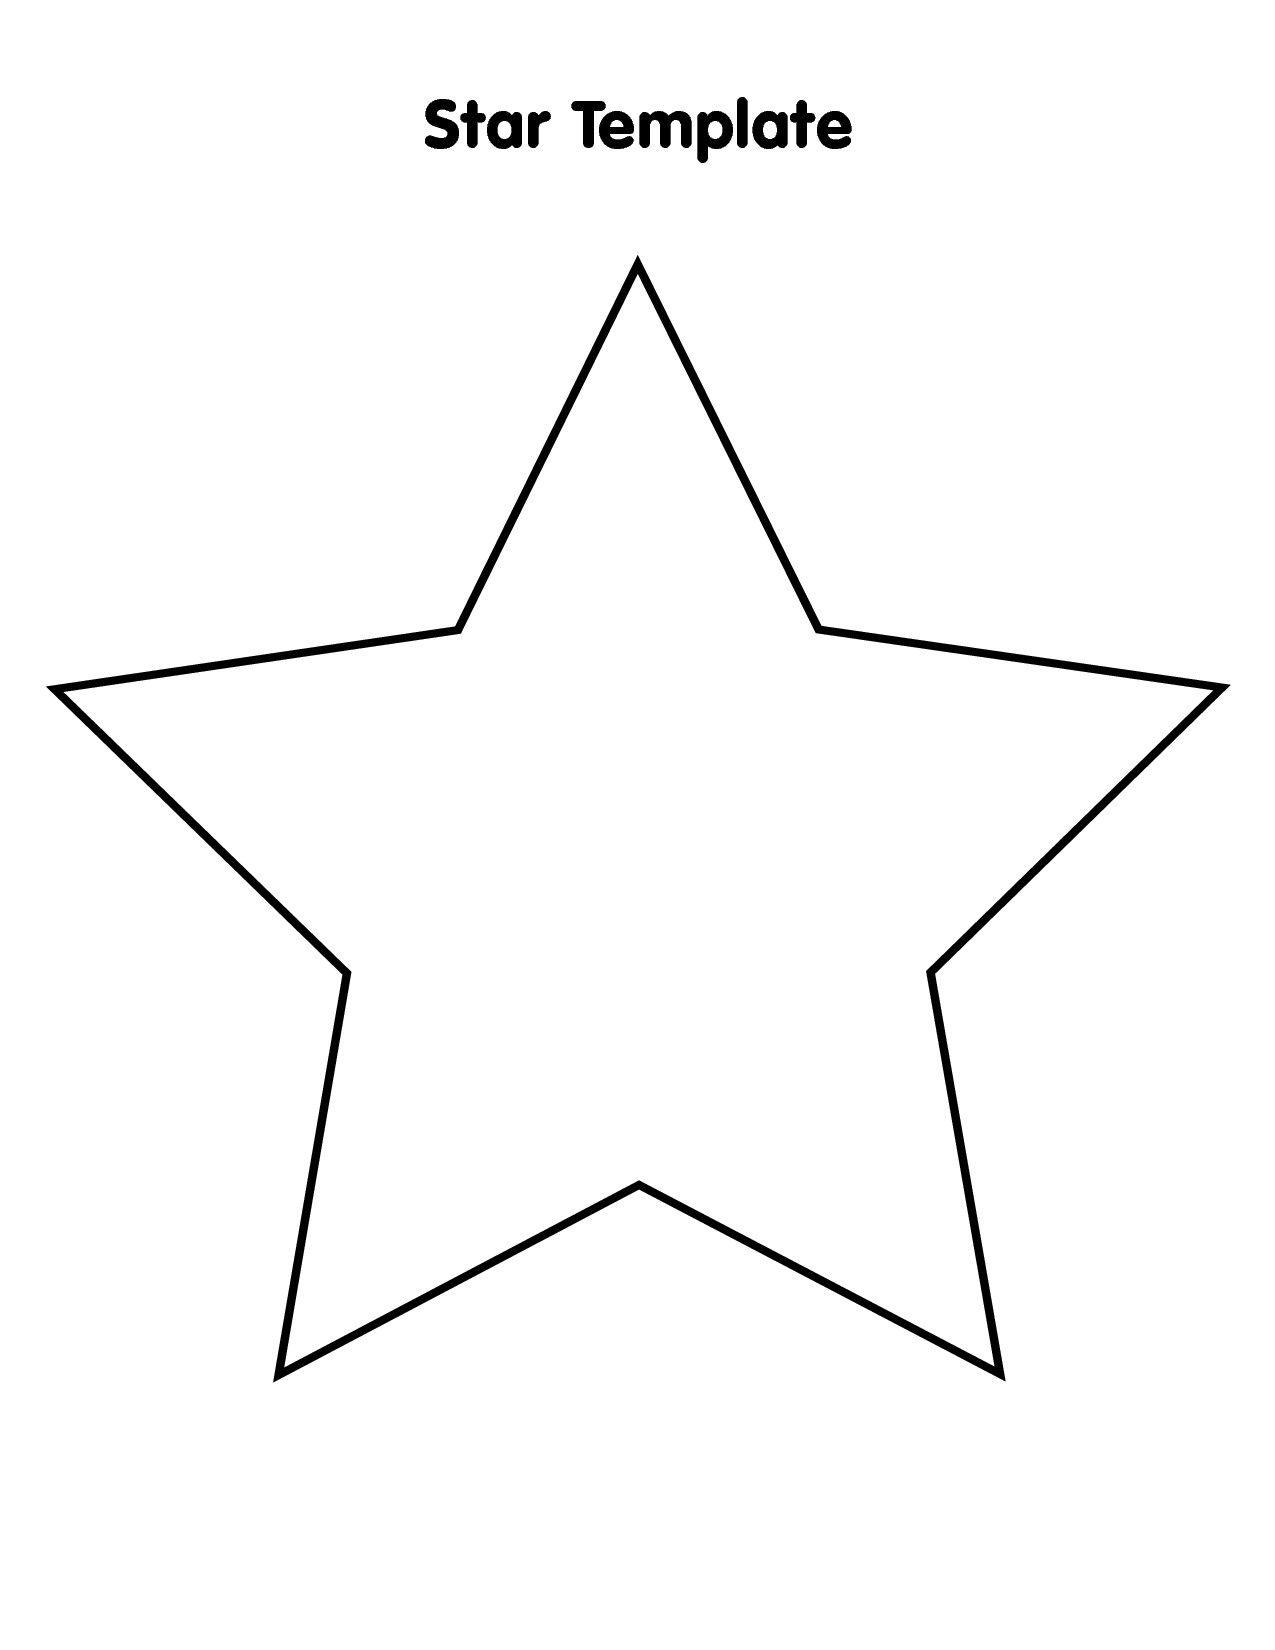 Free Printable Star Template 9 Best Of Big Star Template Printable Stars Star Template Star Template Printable Printable Star